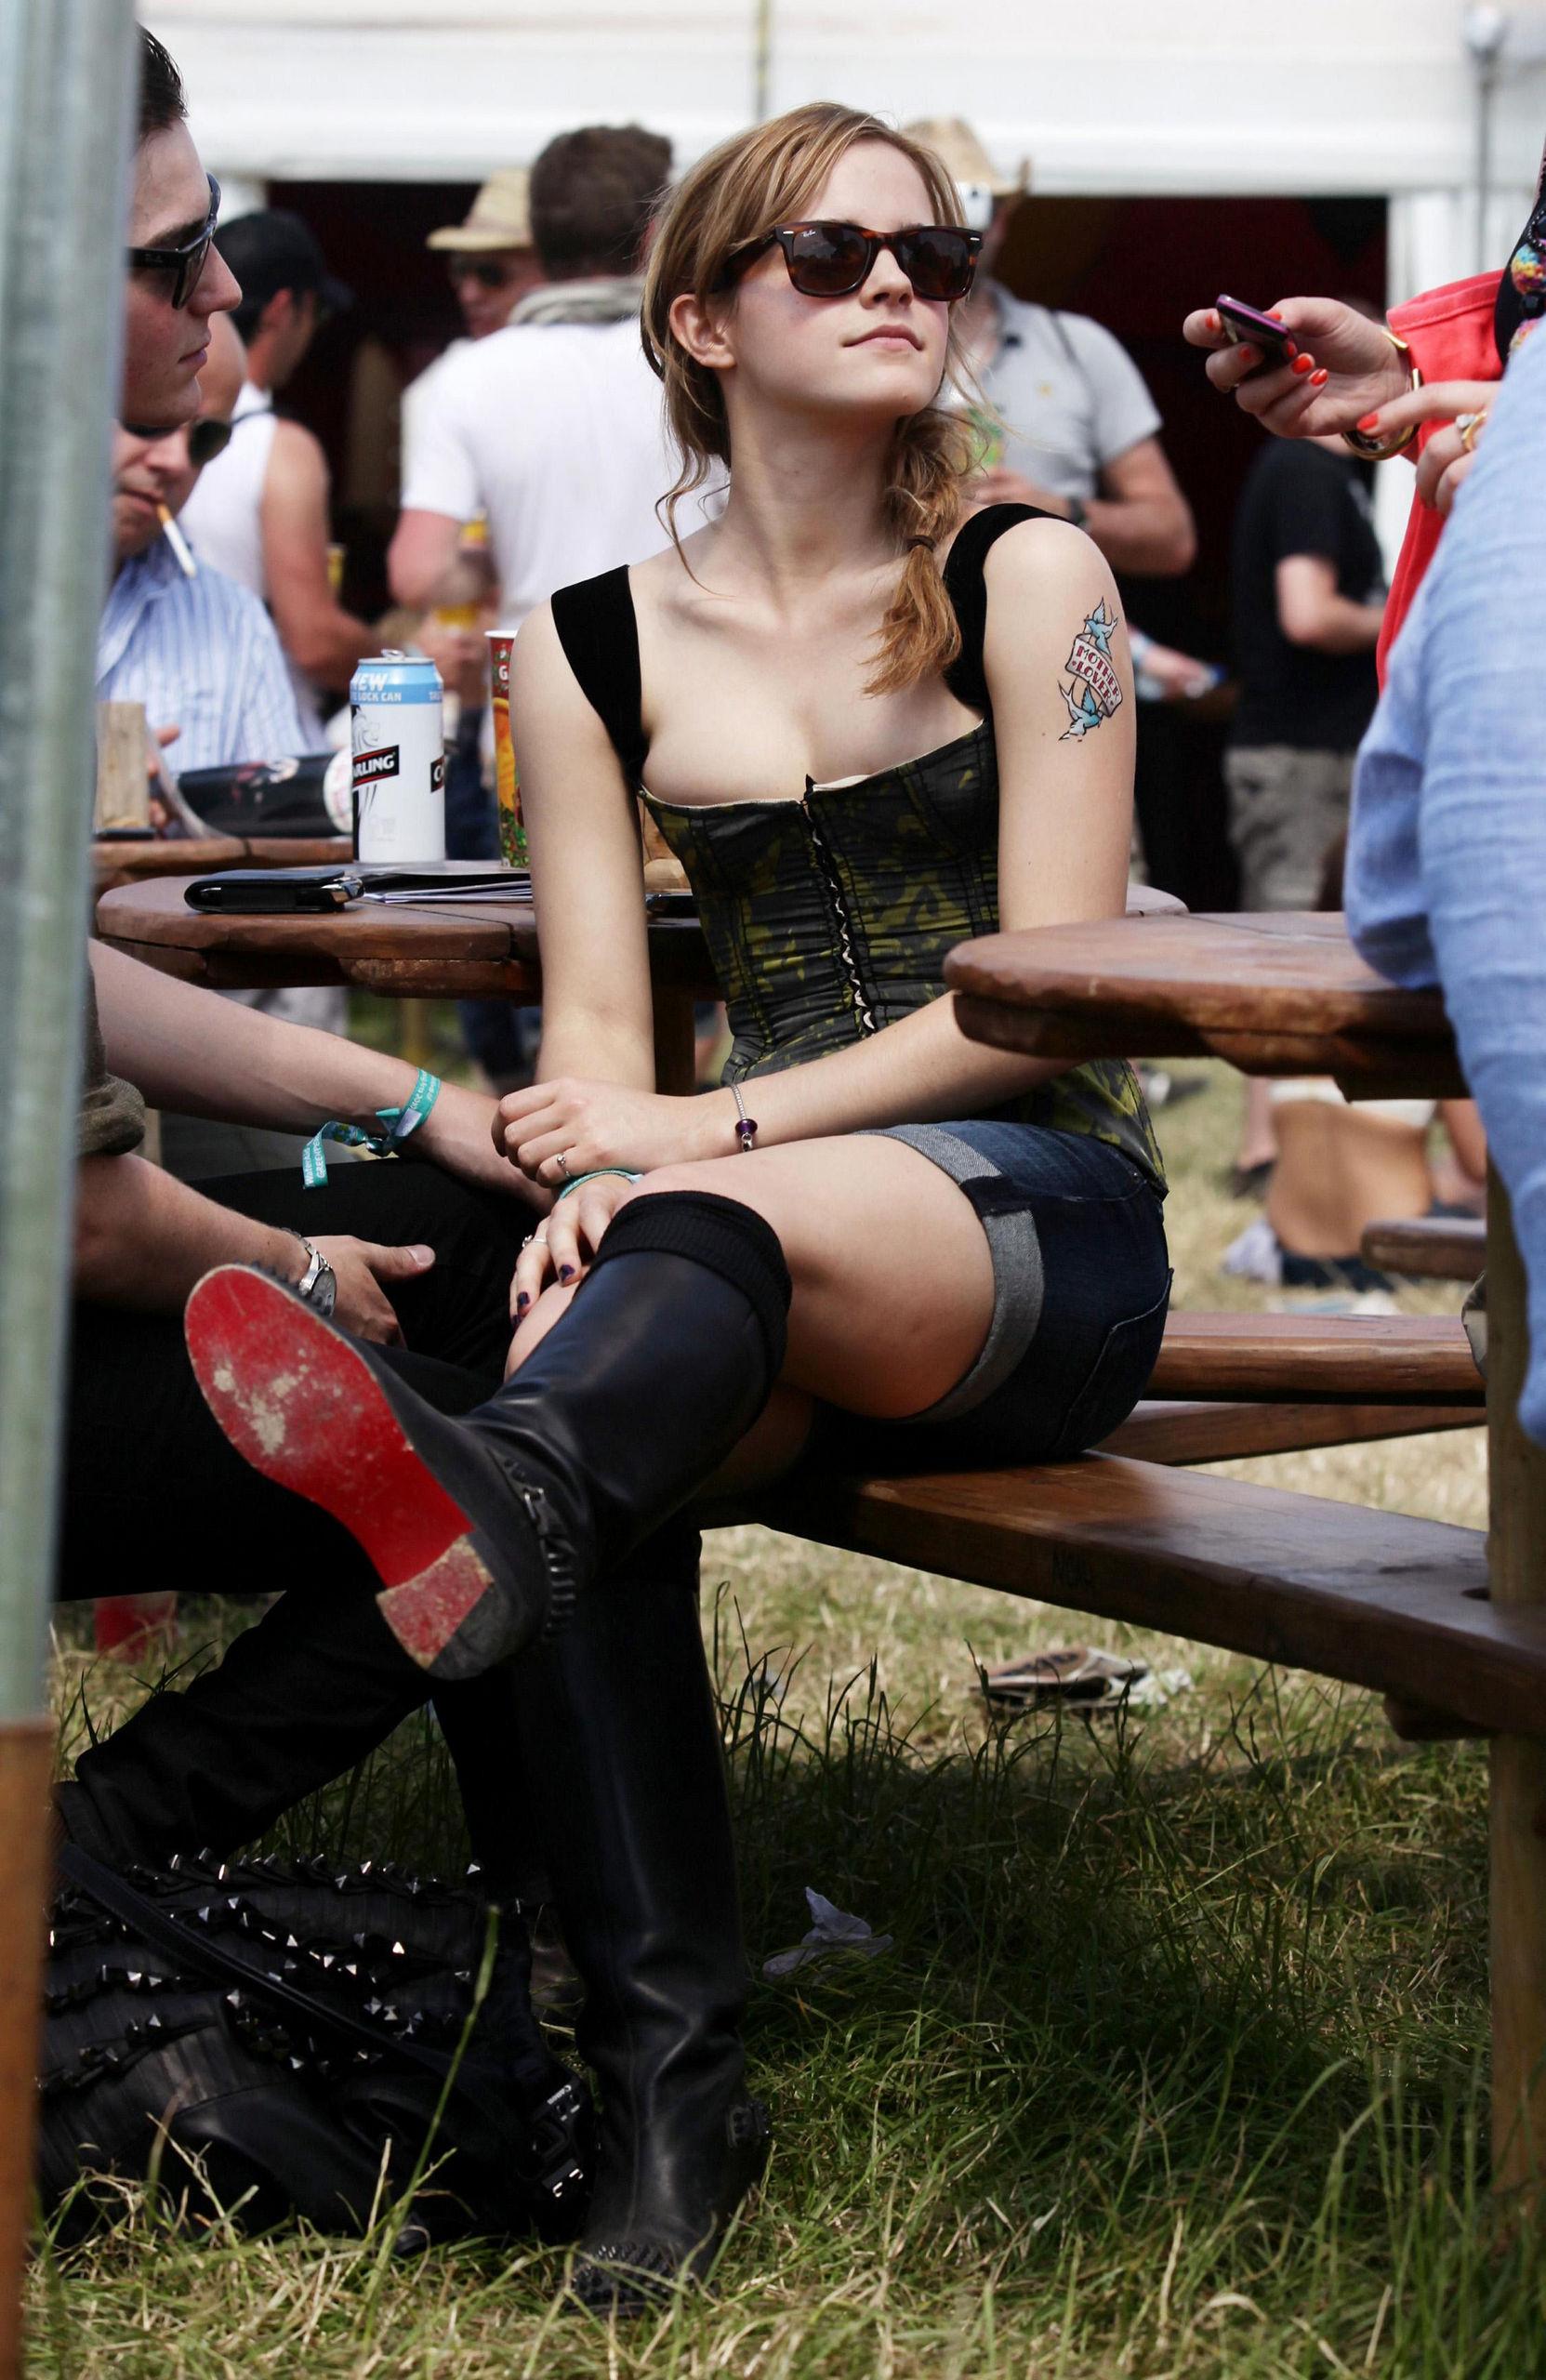 2010 Glastonbury Music Festival in Somerset, England (25